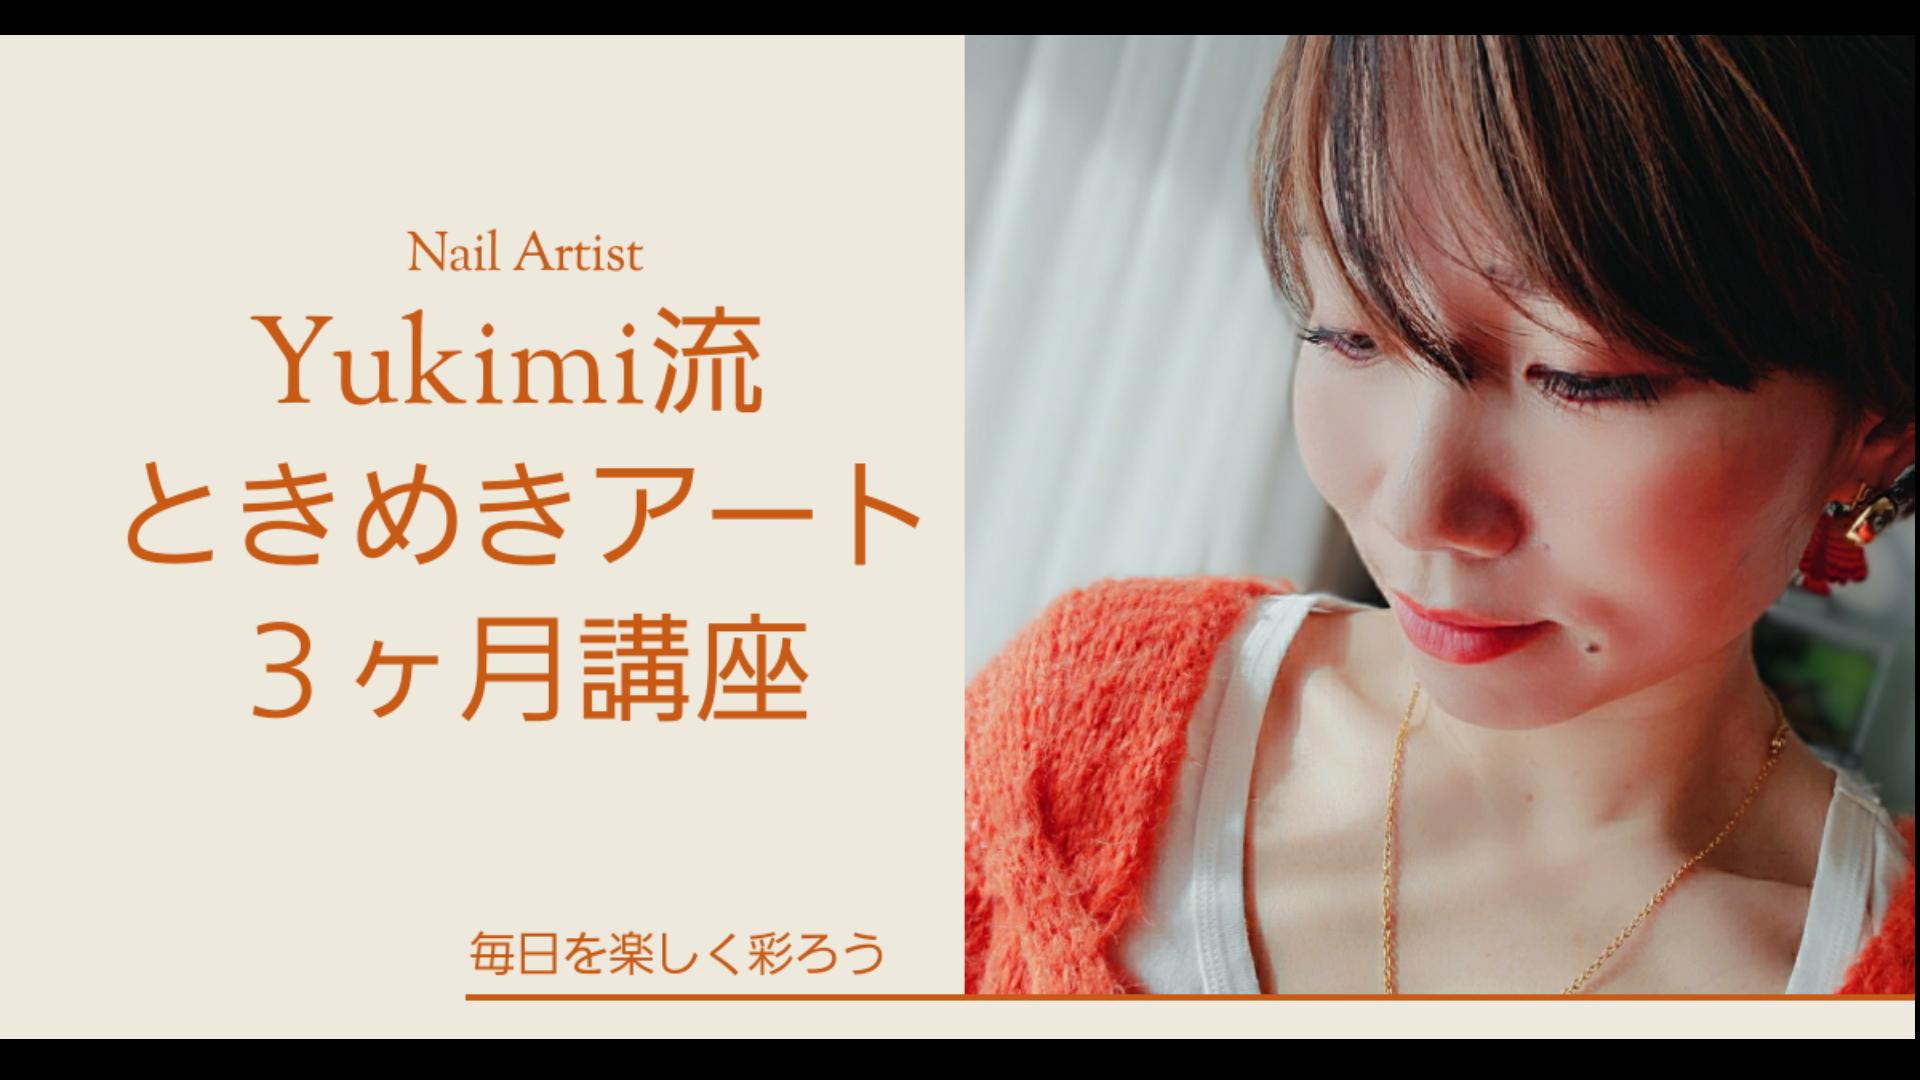 Yukimi - 【第2期】 Yukimi流ときめきアート3ヶ月講座  6/1開講~ - DMM オンラインサロン